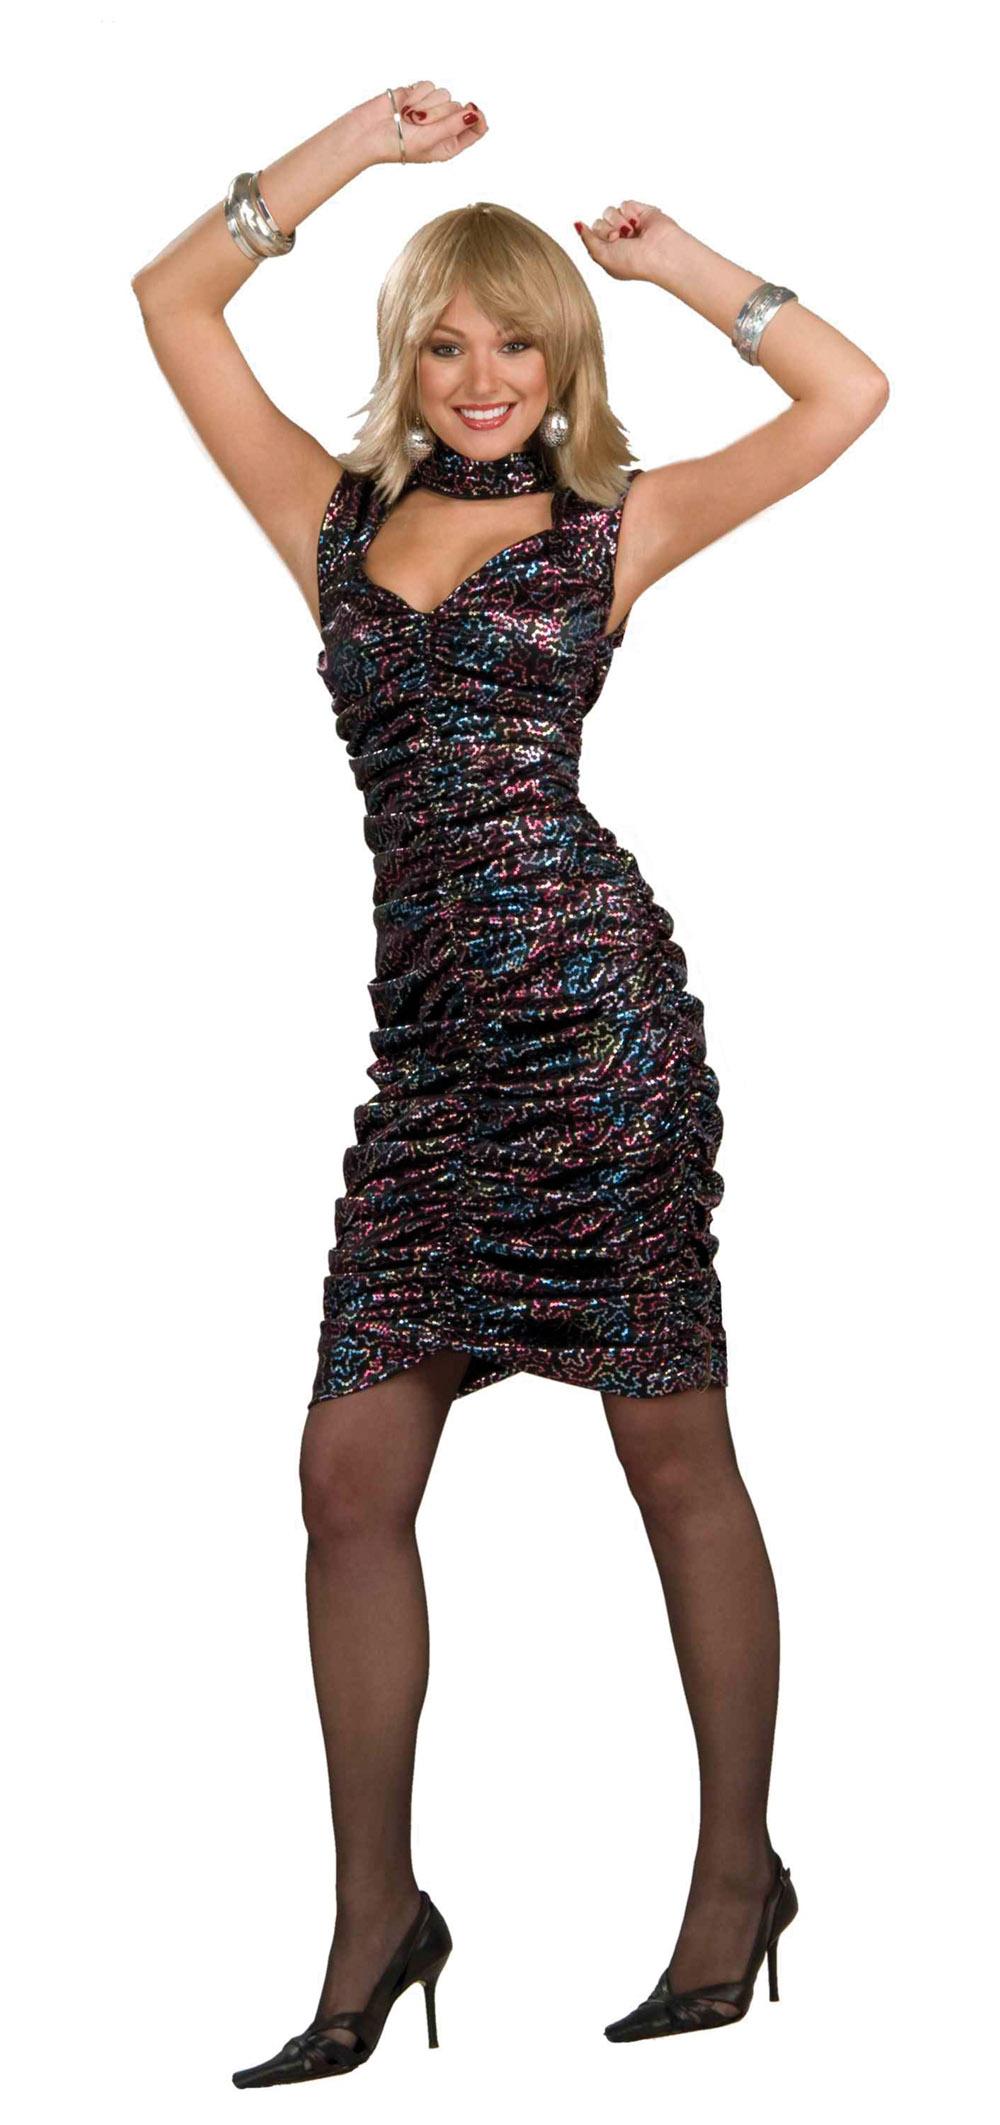 Ladies Black Glitter Disco Fancy Dress Costume 1980s 80s Womens Outfit UK 10-14  sc 1 st  Fancy Dress 365 & Ladies Black Glitter Disco Fancy Dress Costume 1980s 80s Womens ...